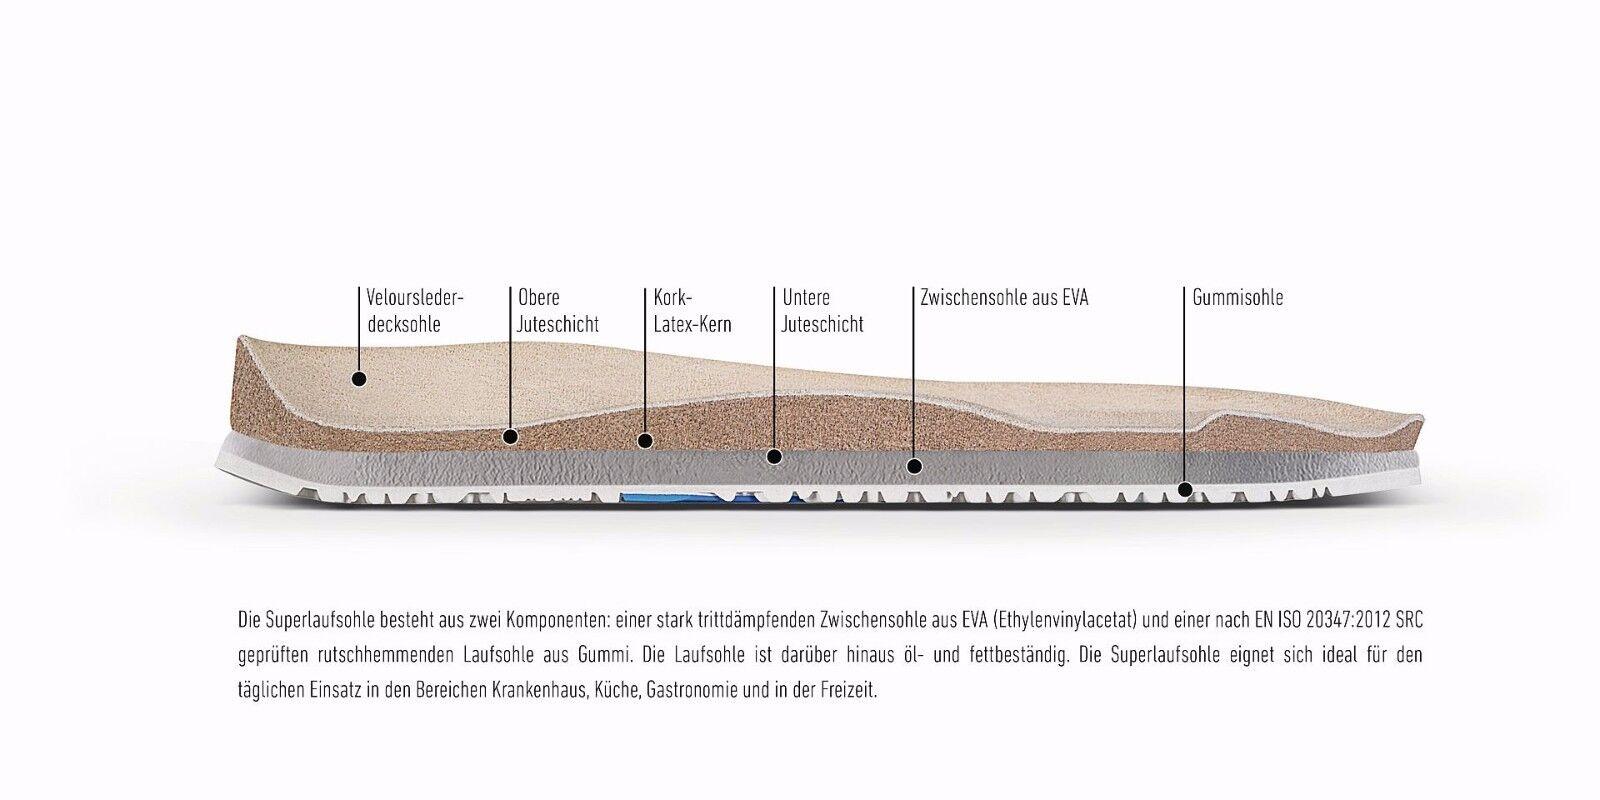 Birkenstock 36,37,40,41,42 Kay dog Blau buster 36,37,40,41,42 Birkenstock mit Fersenriemen Superlaufsohle eacafb